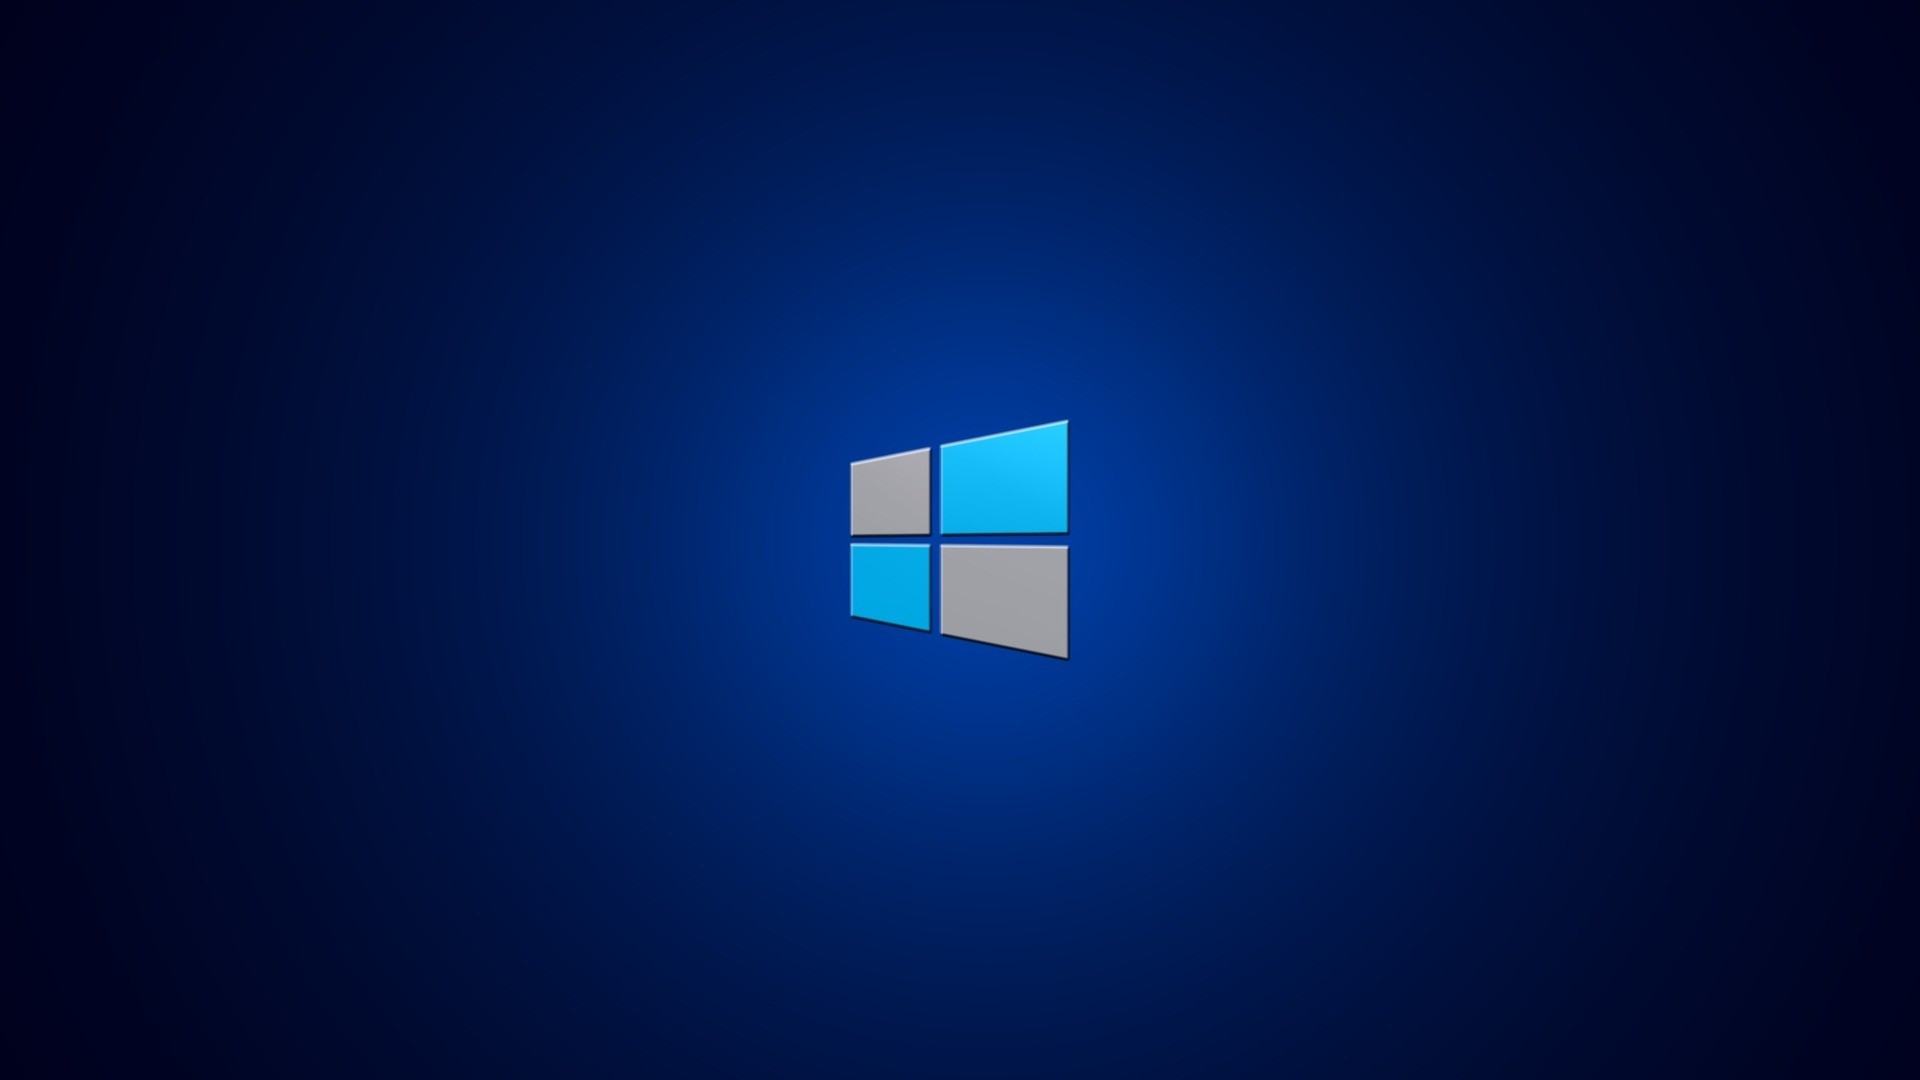 Windows 7 Wallpaper 1366x768 Wallpapertag